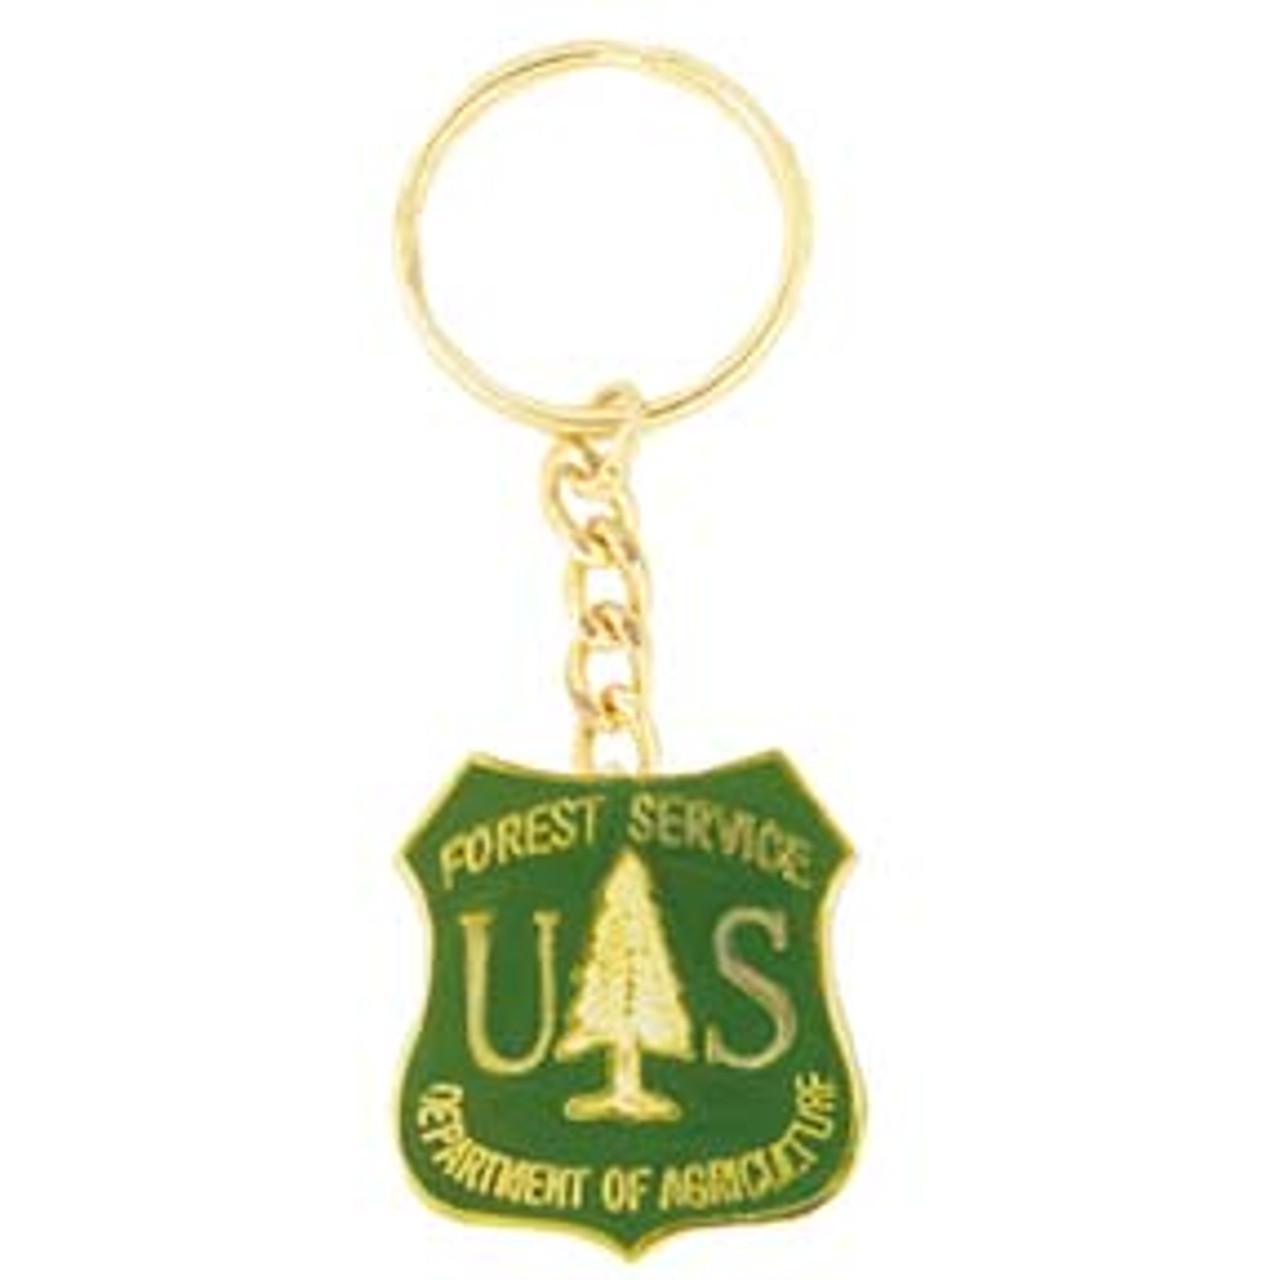 Forest Service Shield Keychain